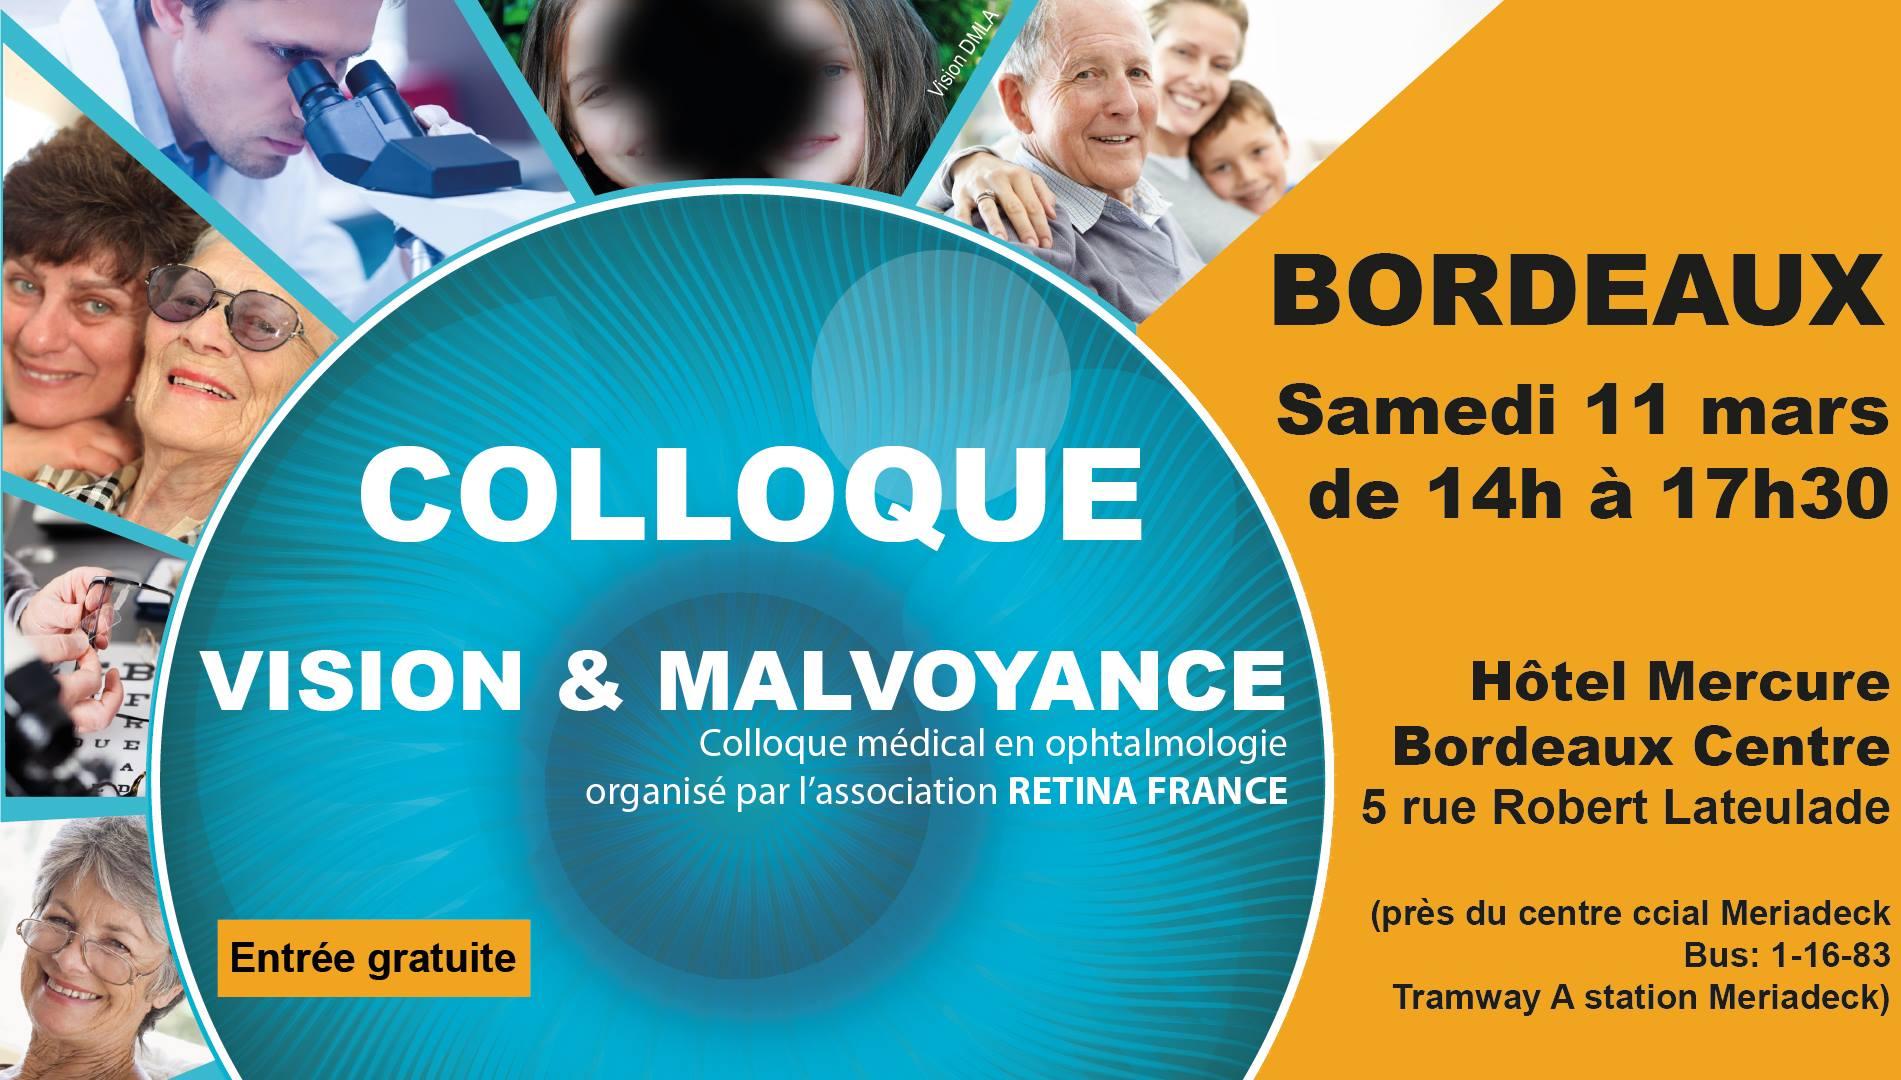 Colloque Vision & Malvoyance